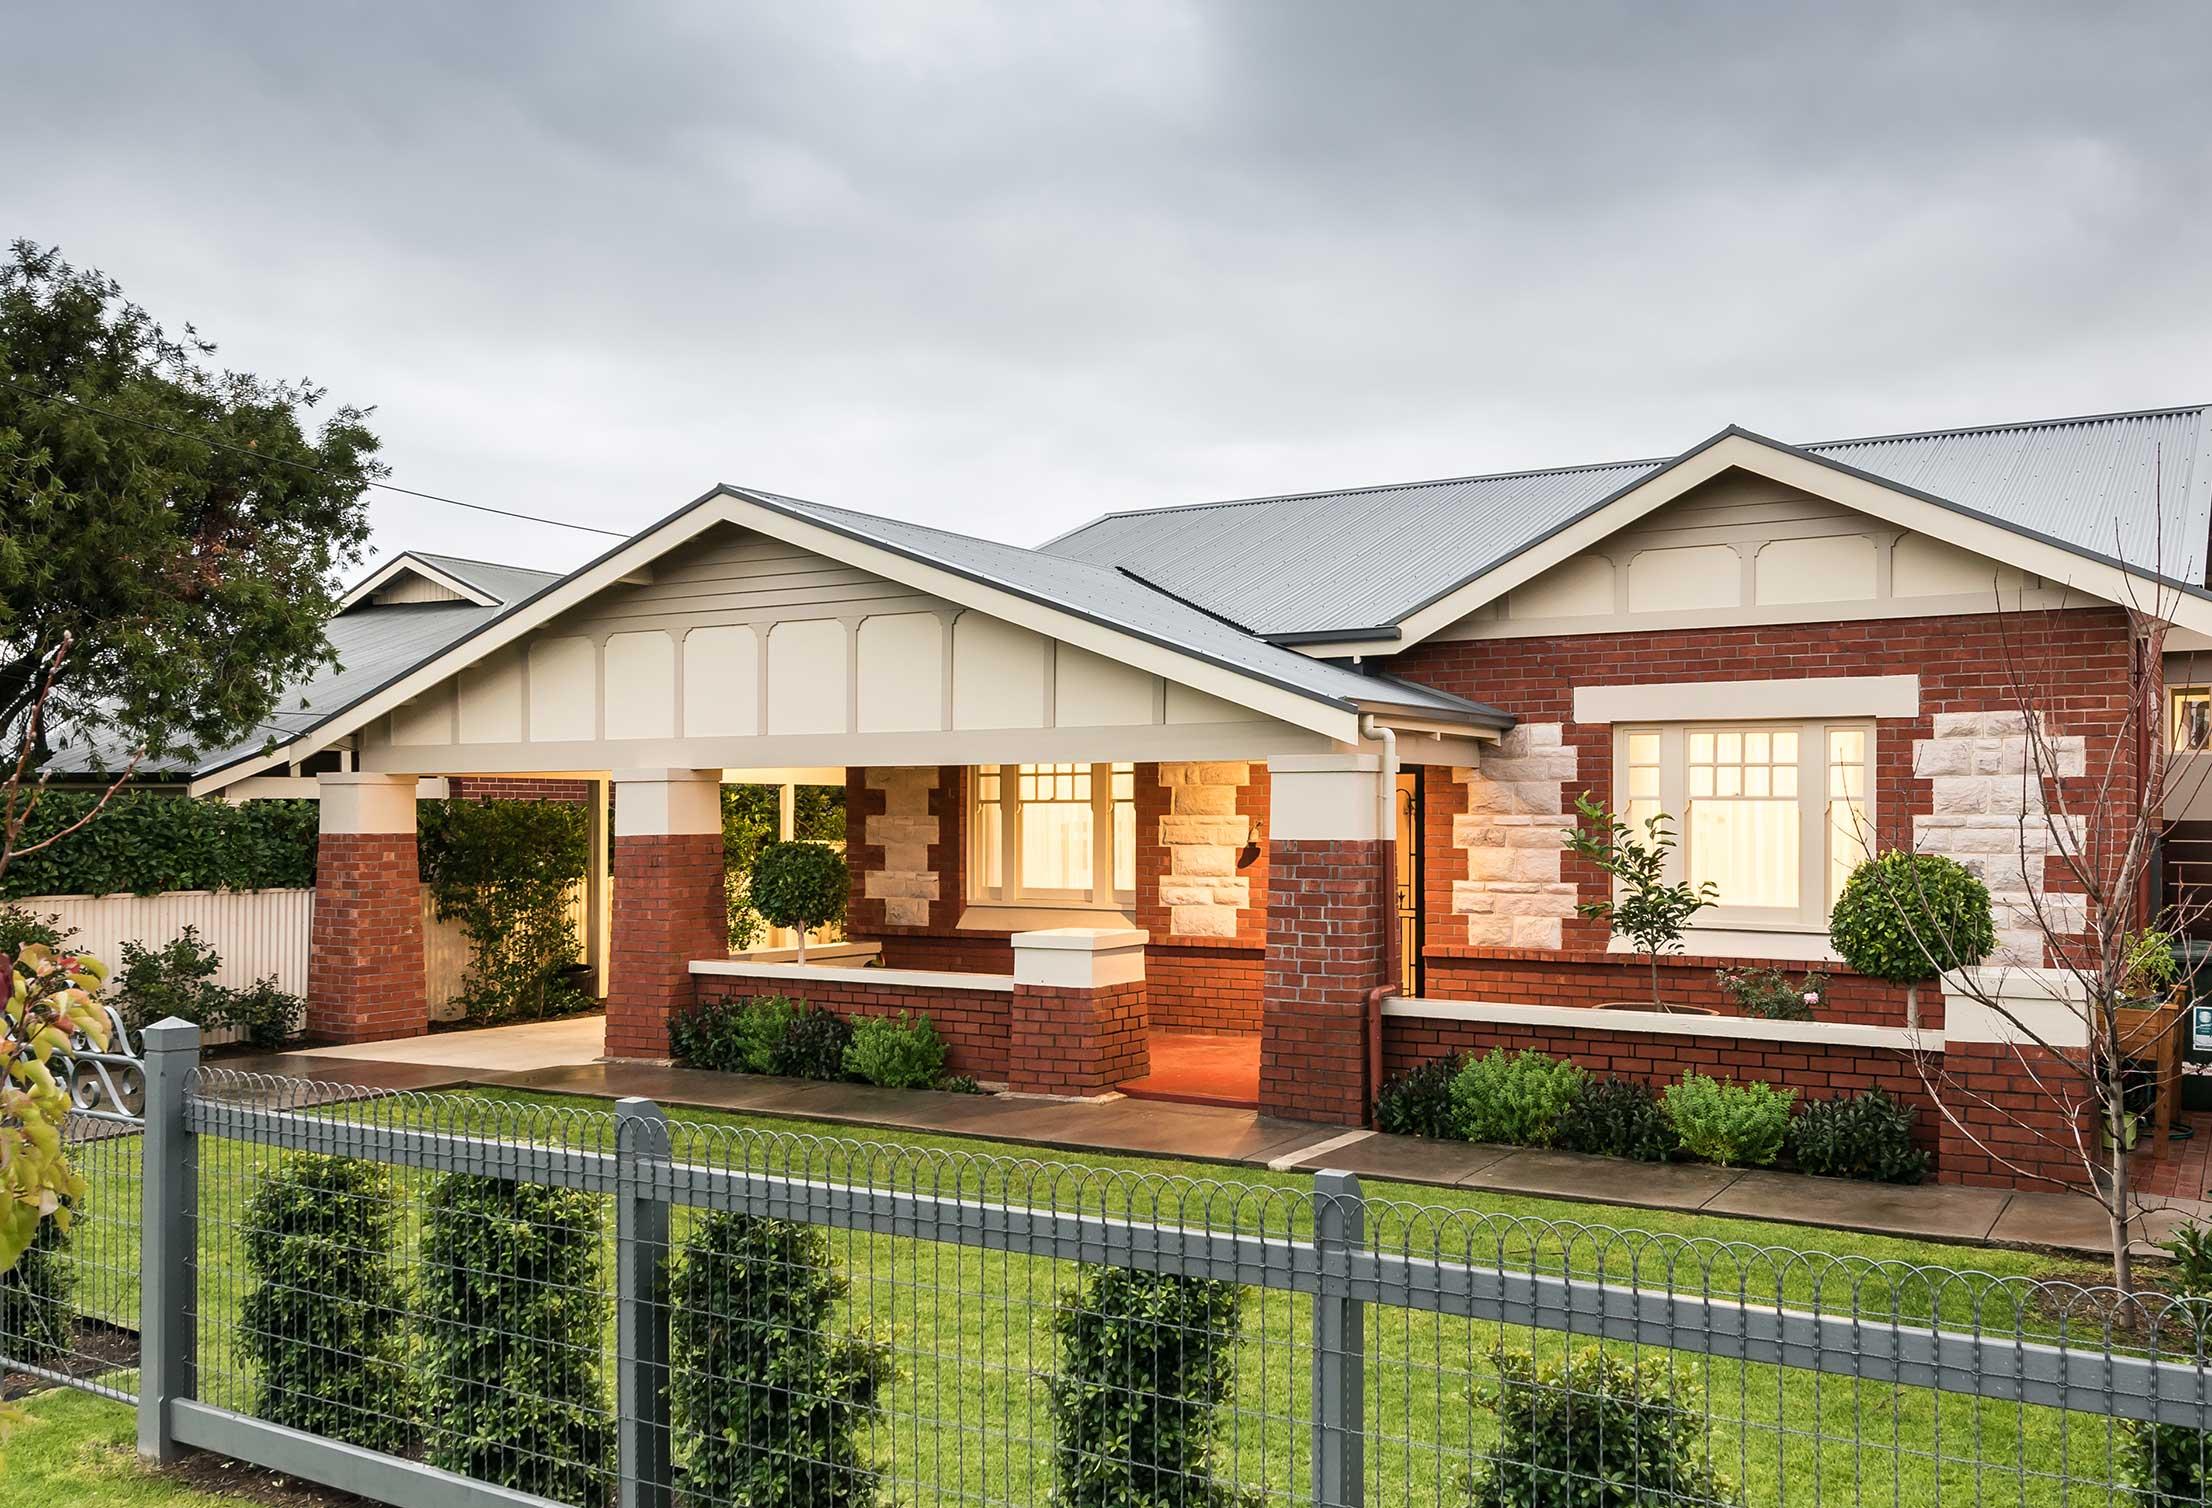 turnbull-built-bungalow-renovations-south-australia.jpg